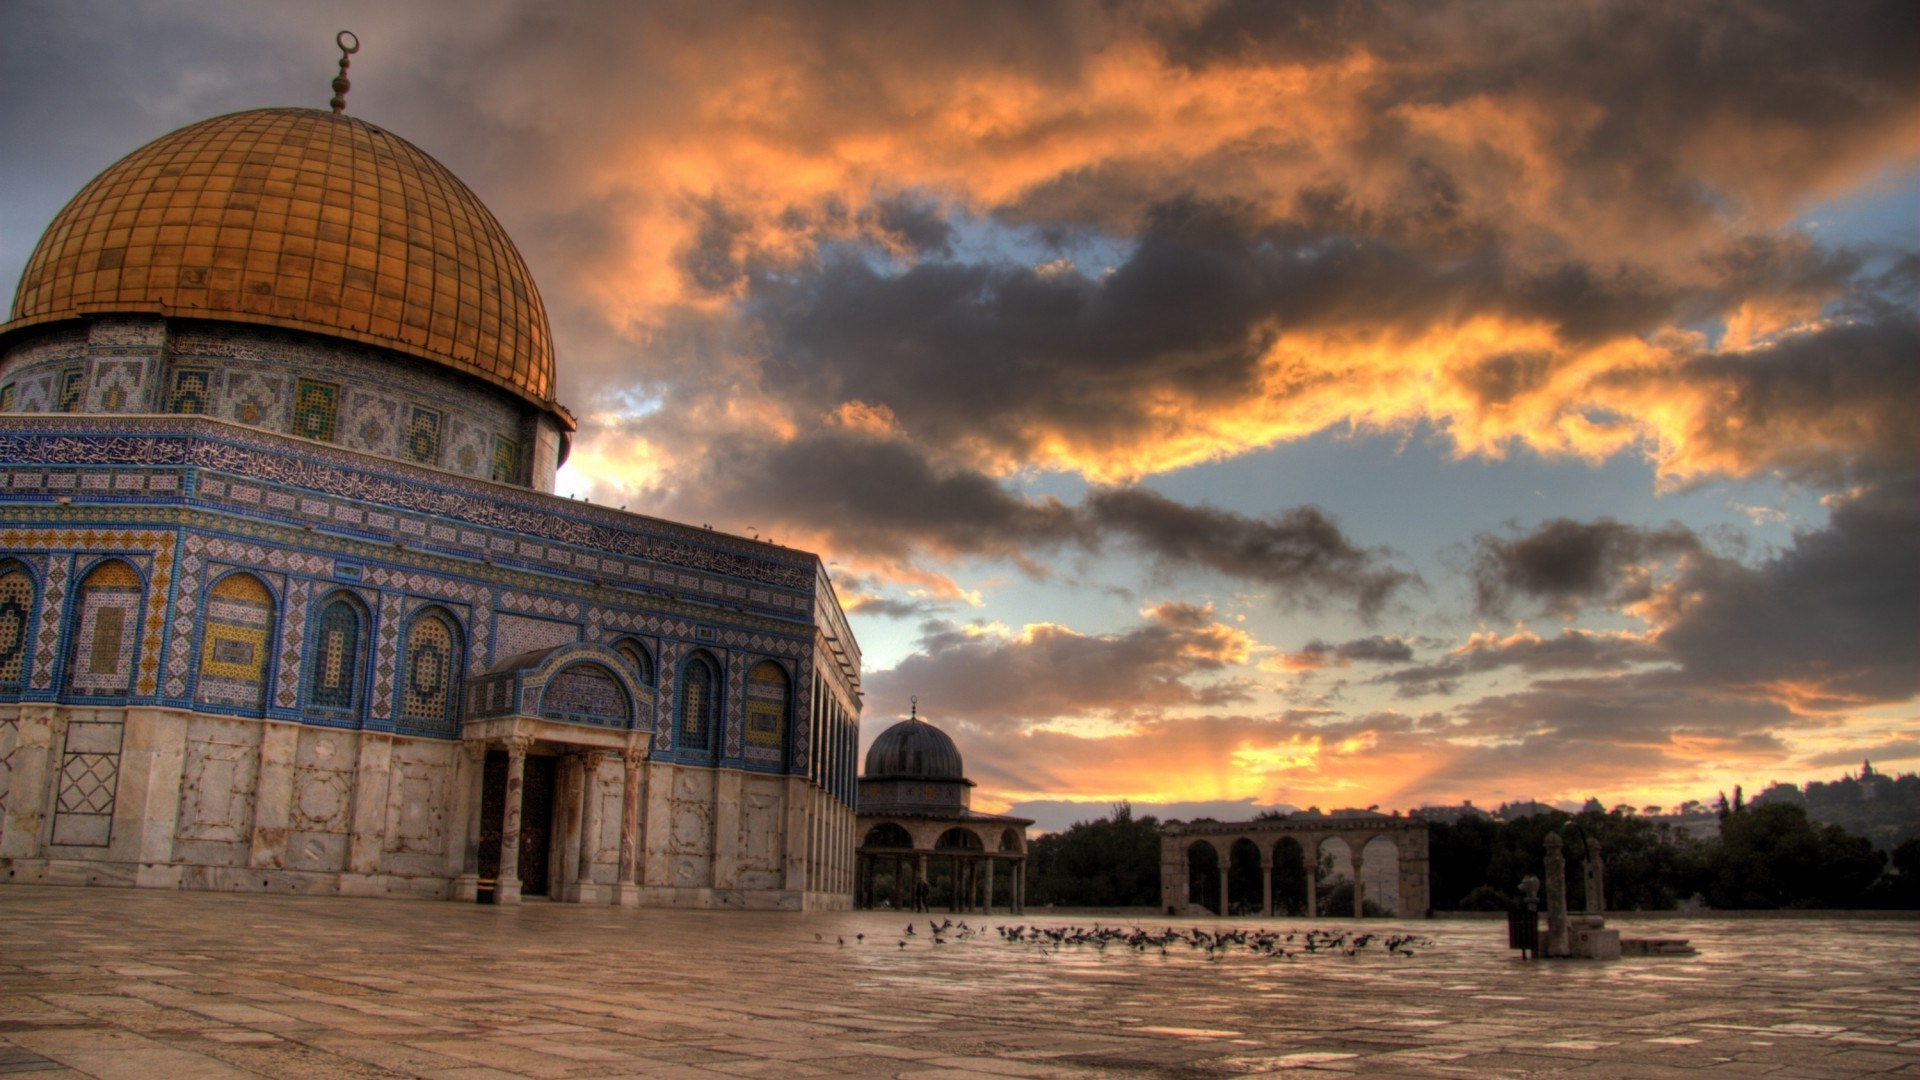 Jerusalem Wallpapers Religious Dome Rock Jerusalem Dome 838877